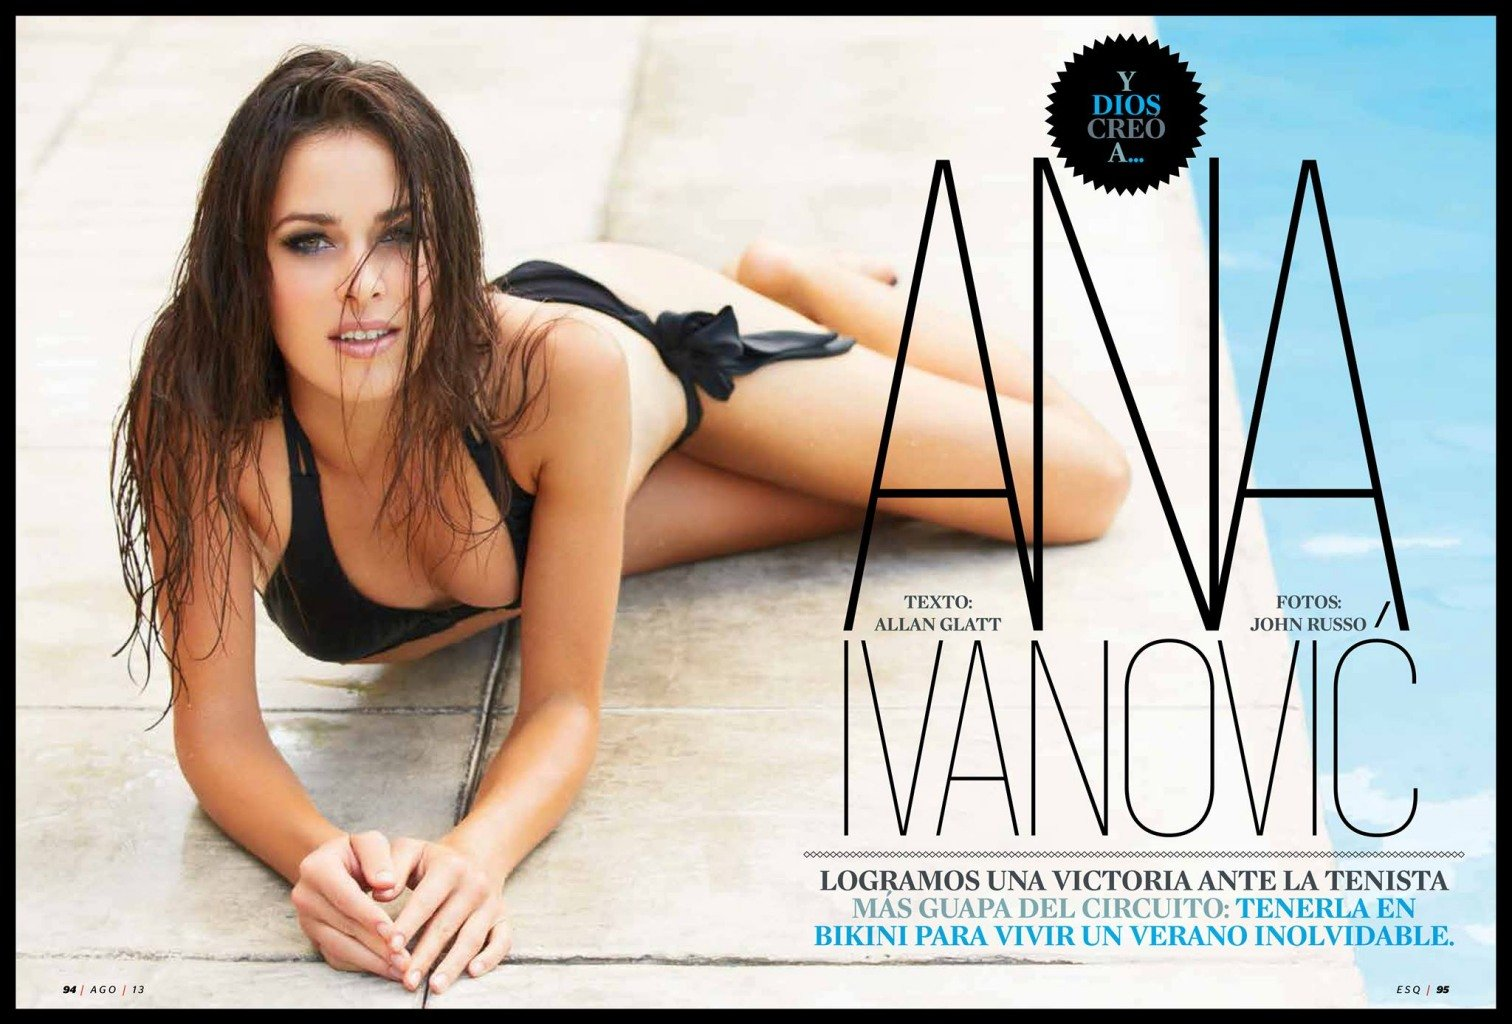 Ana Ivanovic, Serbian tennis player female